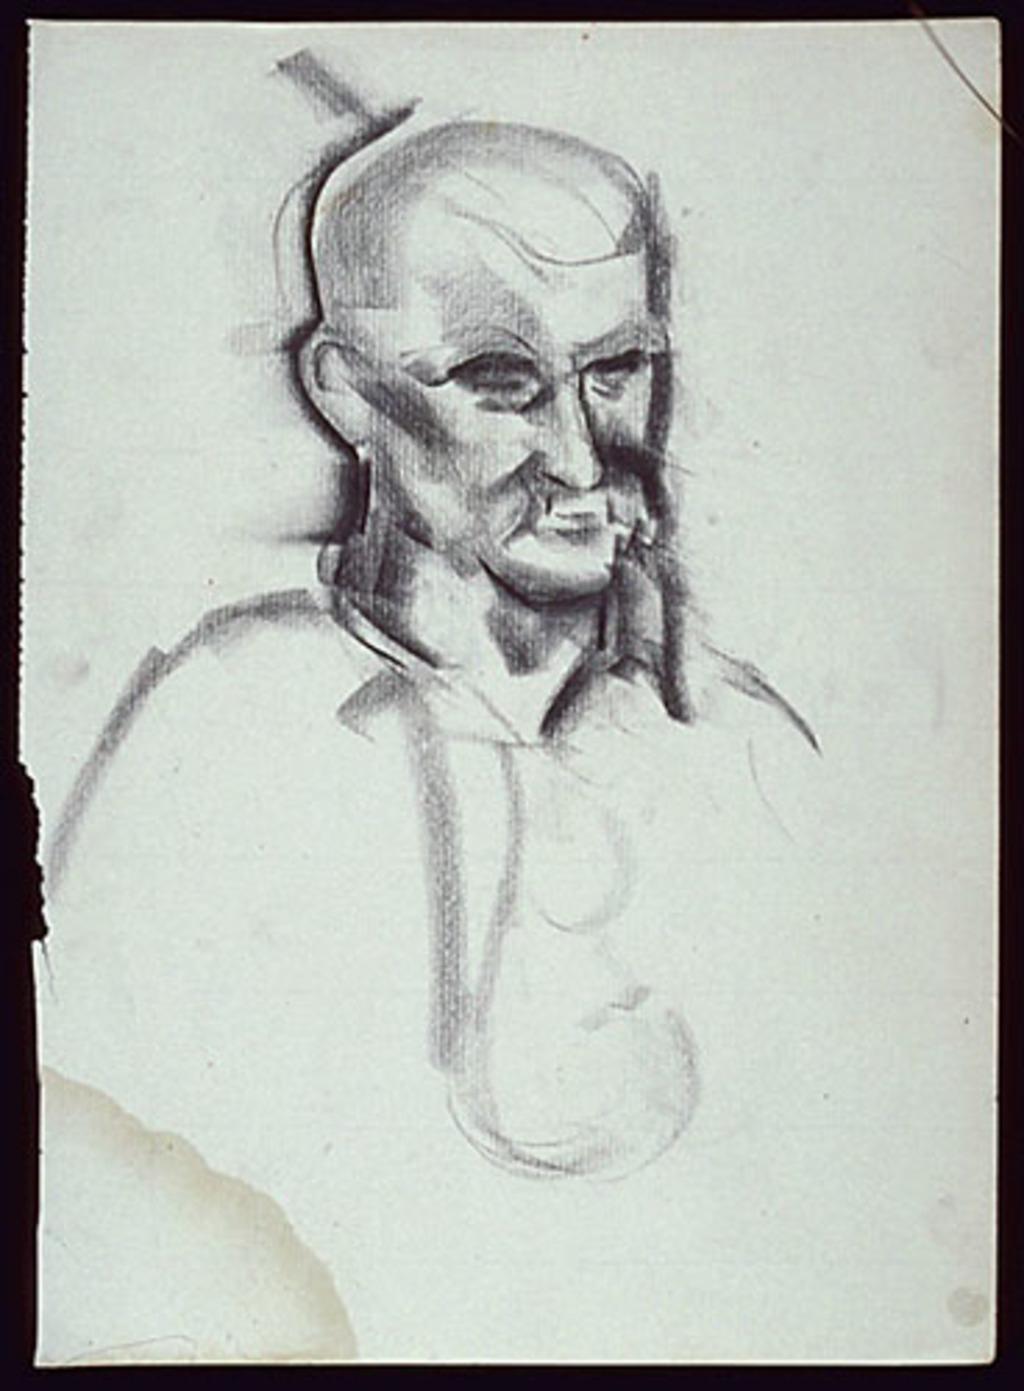 Portrait of a Bald Man (M. Morrow?)